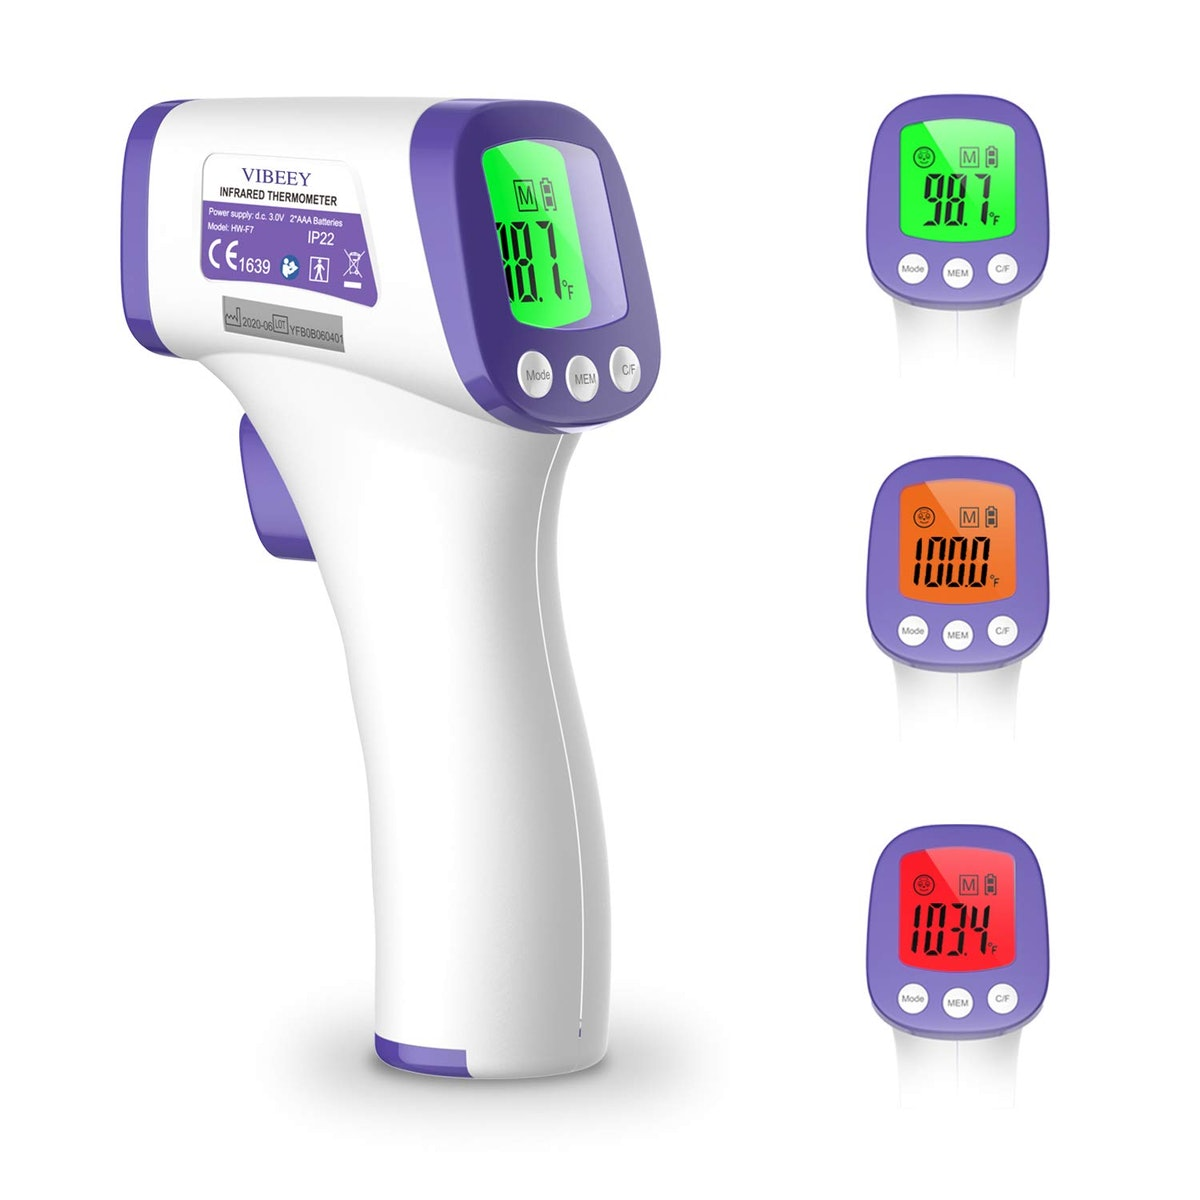 Vibeey Digital No-Contact Forehead Thermometer